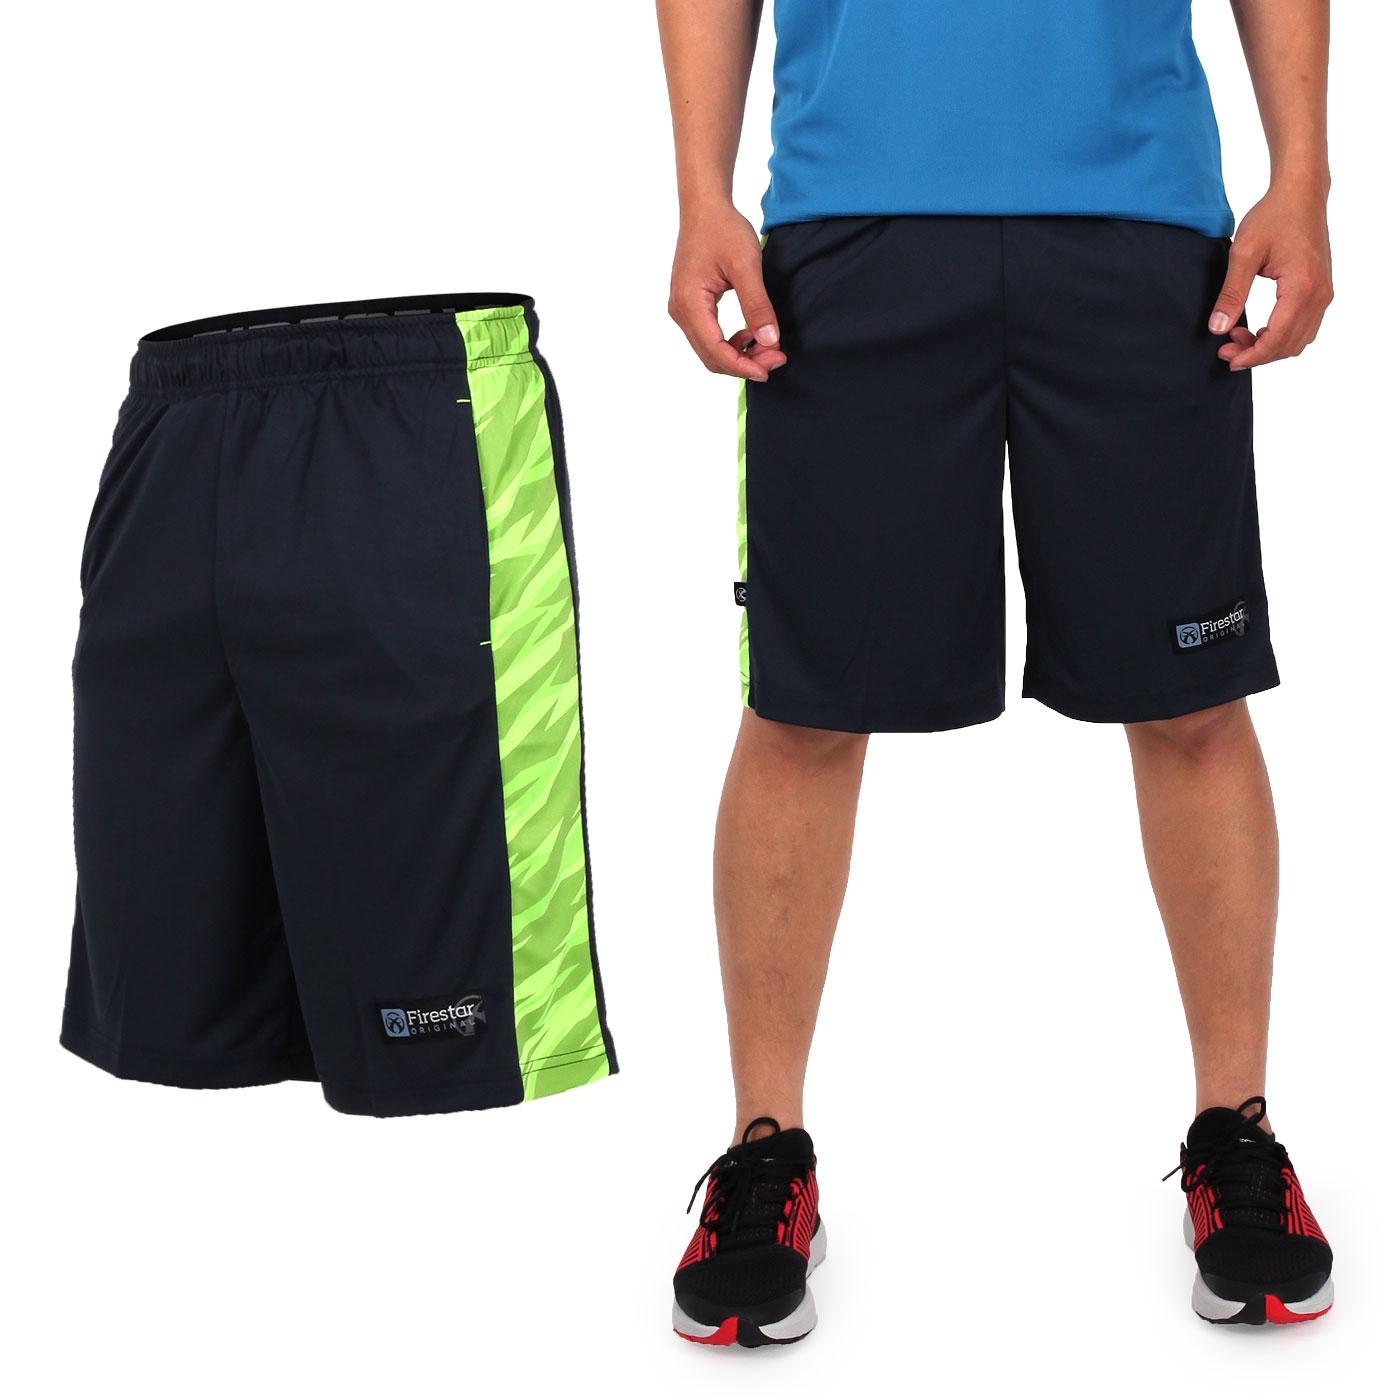 FIRESTAR 籃球褲 B7606-40 - 丈青綠